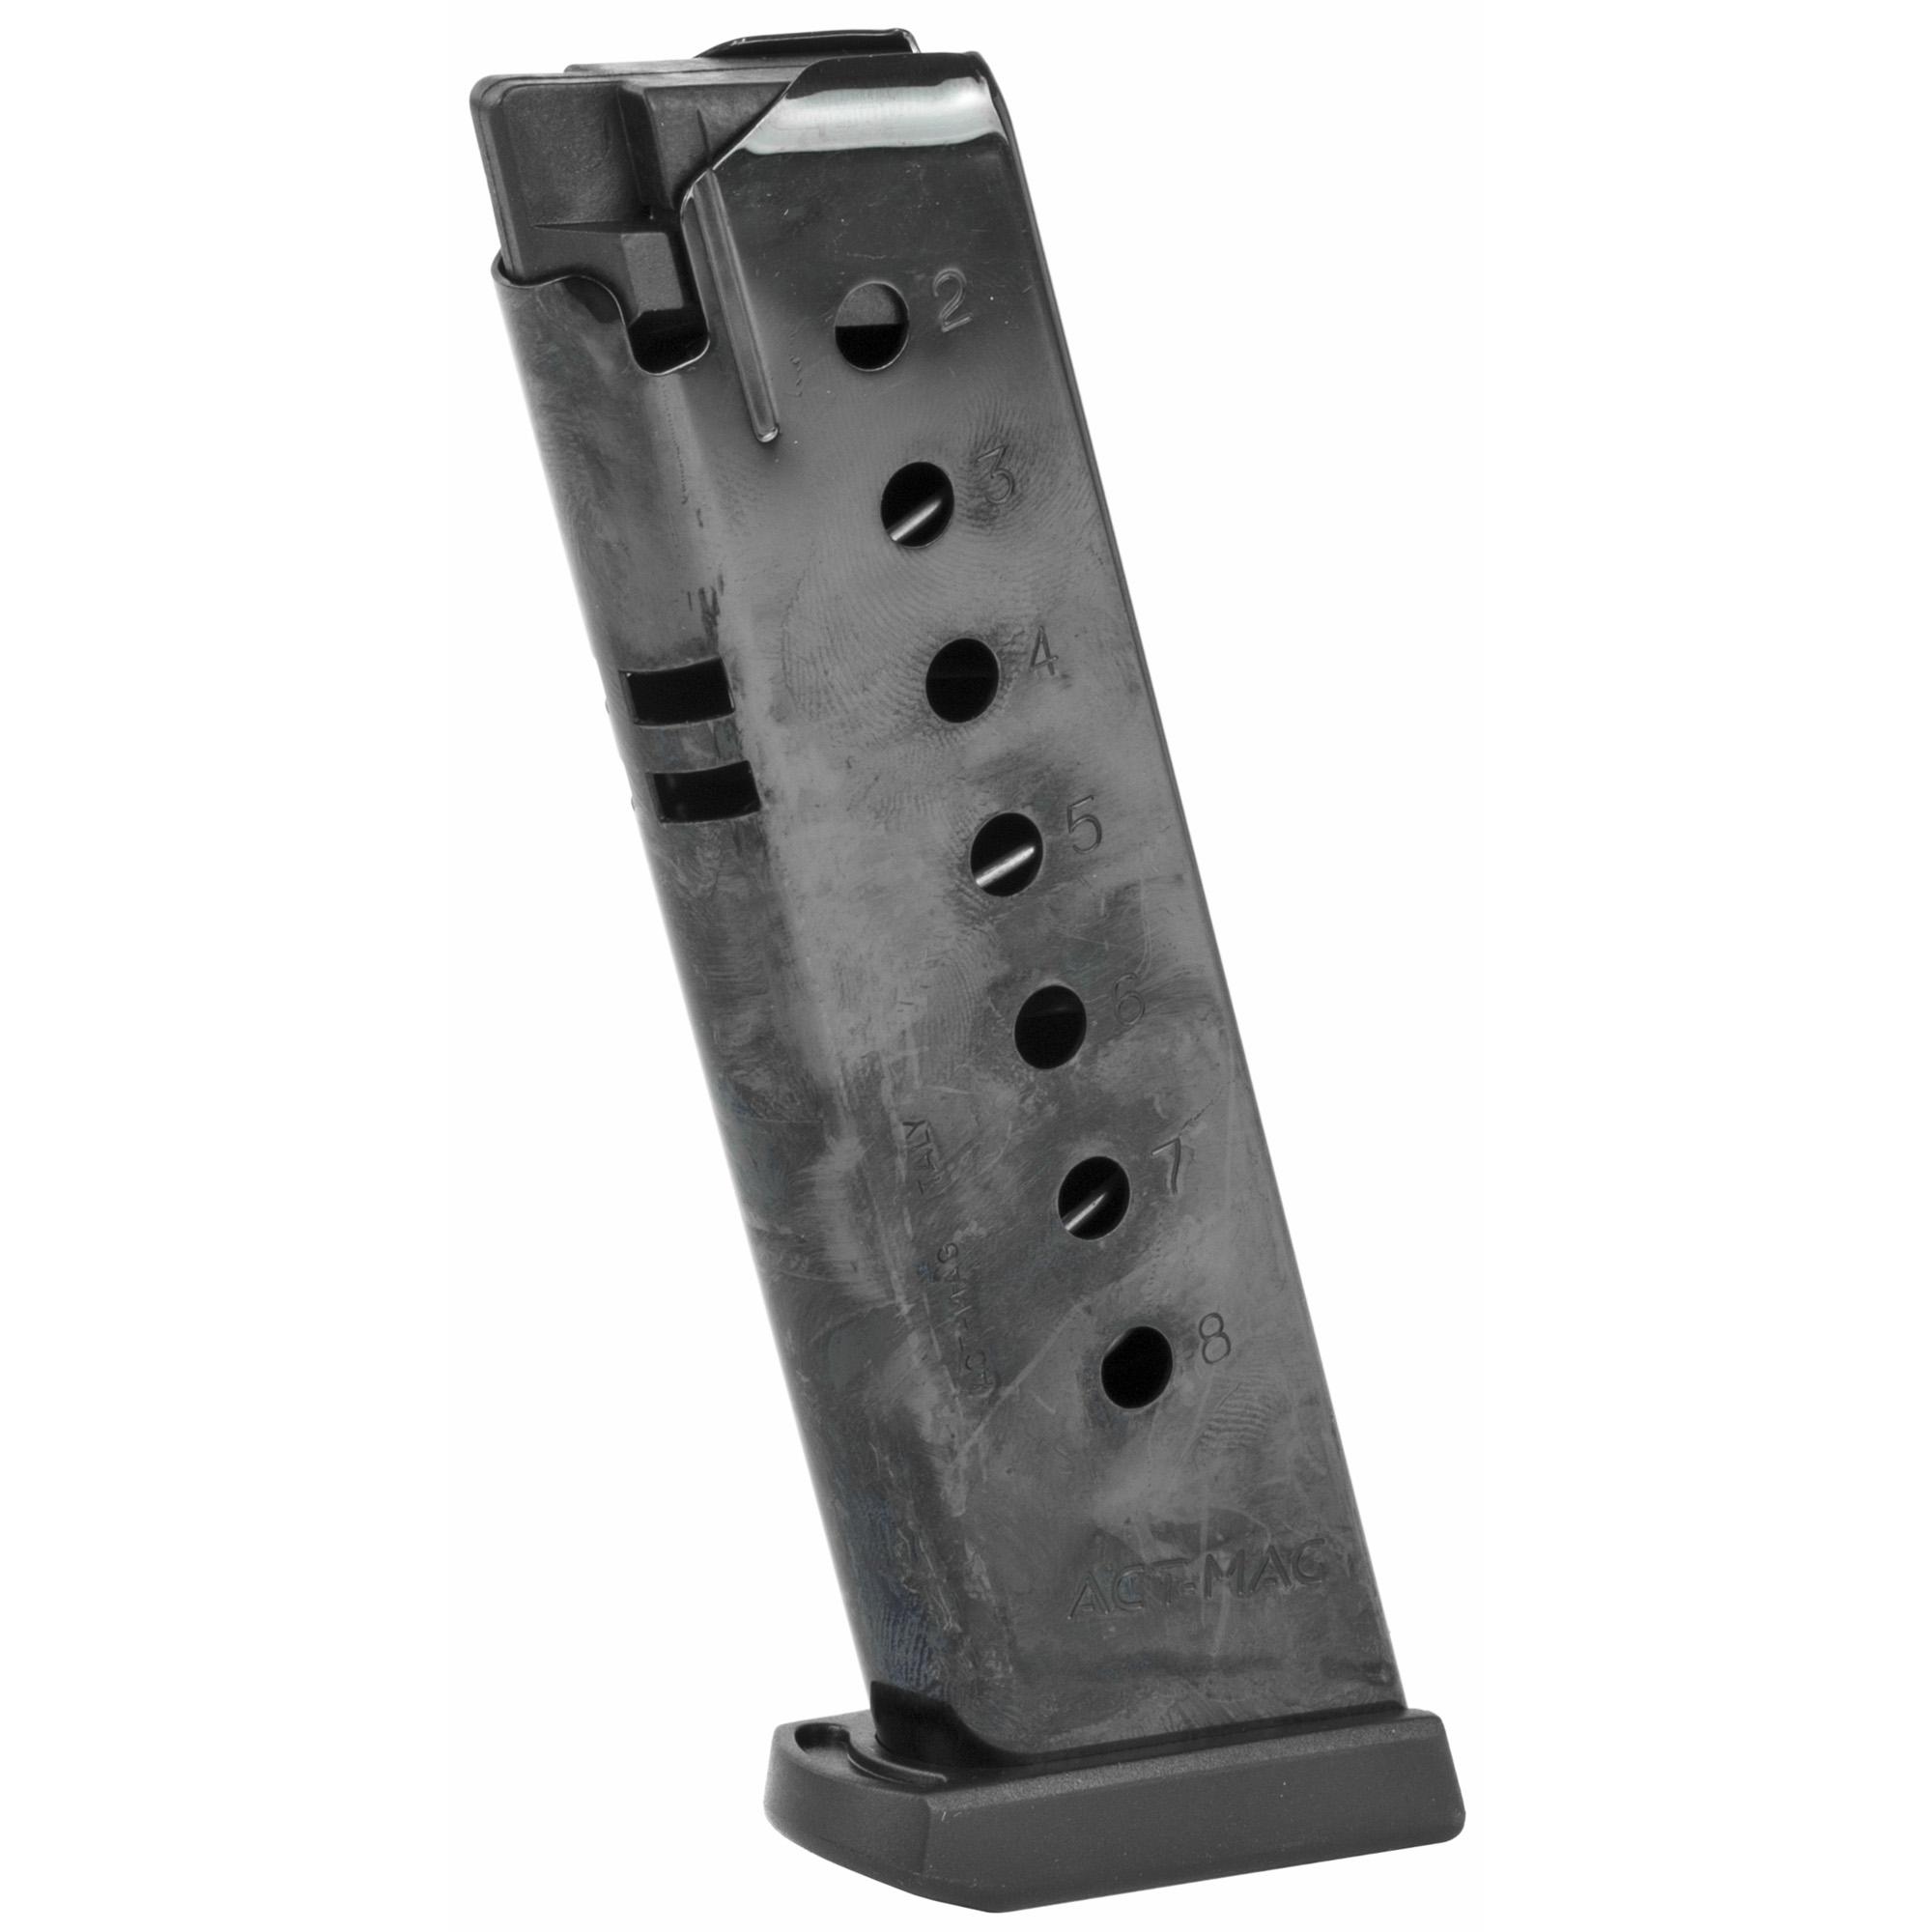 Mag Armscor Sig P220 45acp 8rd Bl